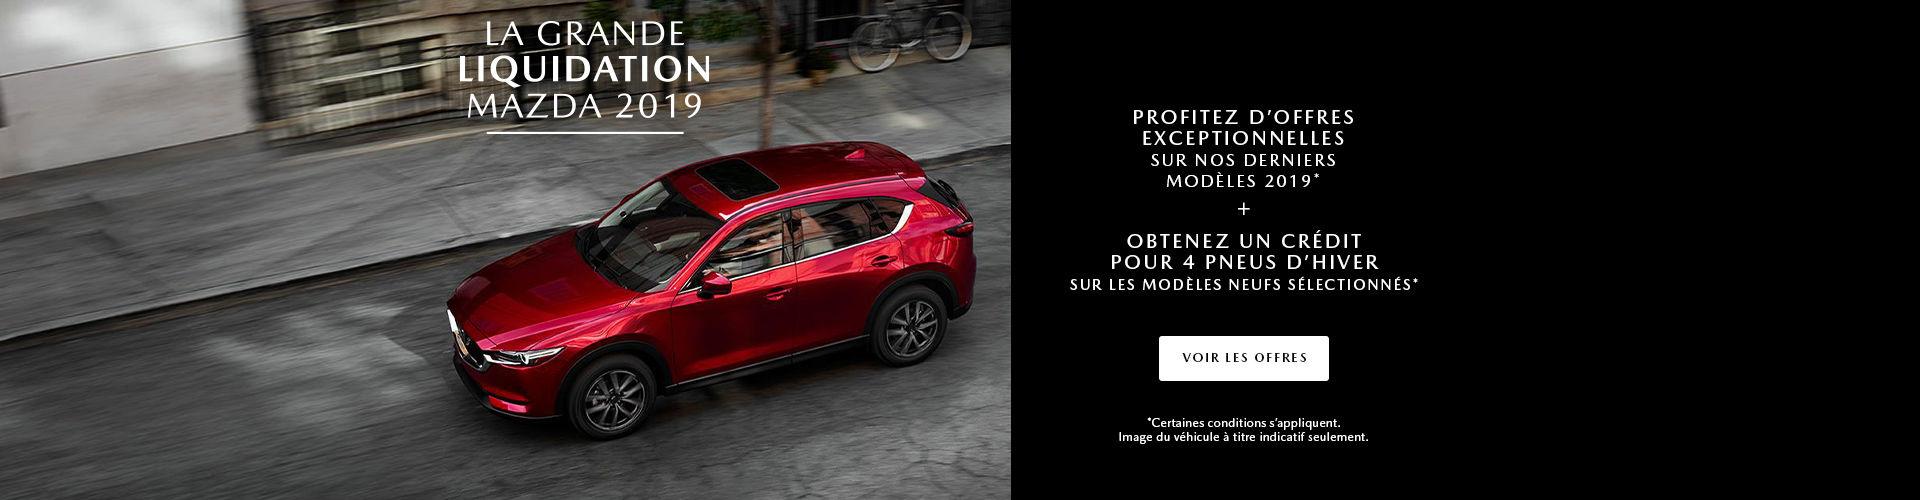 La grande liquidation Mazda